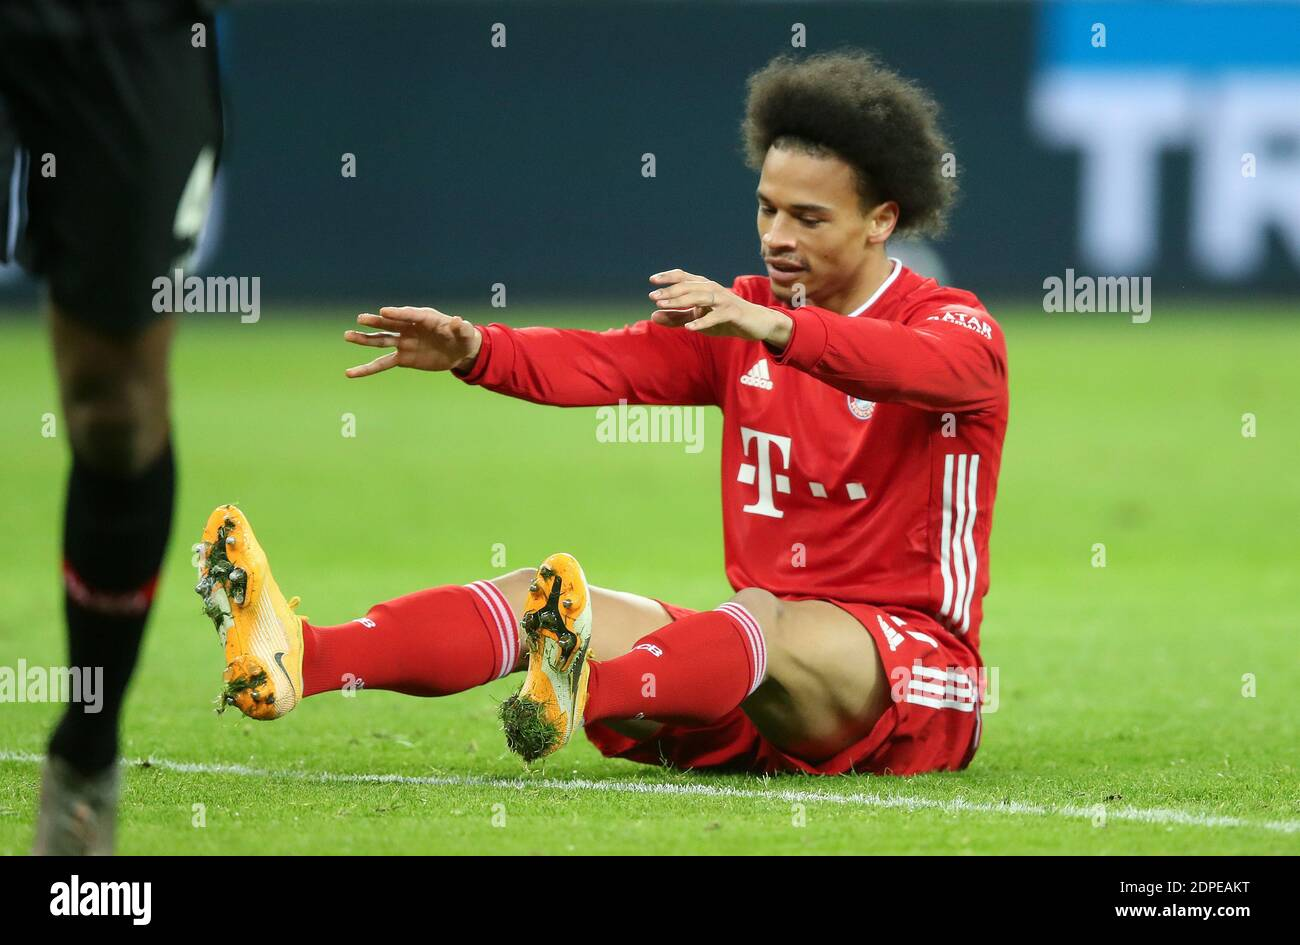 Leroy Sane FC Bayern MŸnchen Leverkusen 19.12.2020  in  BayArena  Bayer Leverkusen vs FC Bayern Muenchen Munich  Football Bundesliga  Fussball 1. Bundesliga Saison 2020 / 2021   © diebilderwelt / Alamy Live News Stock Photo